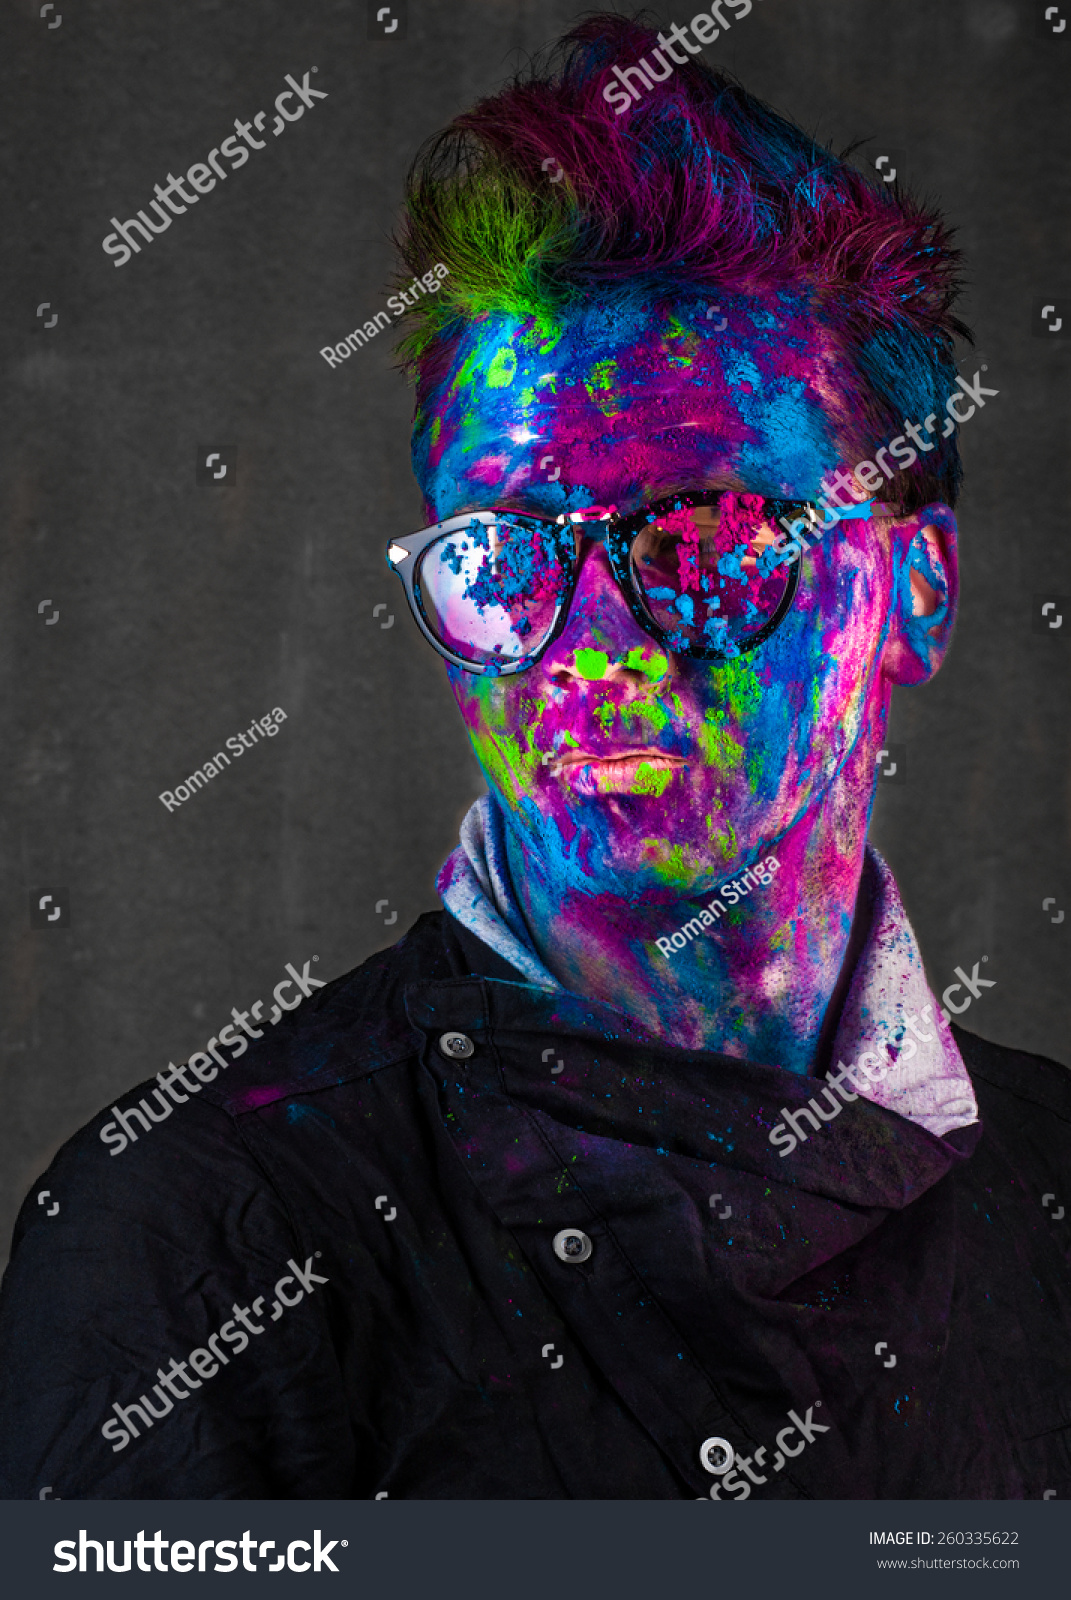 Vivid Portrait Of Hipster Guy In Glasses Stock Photo ...